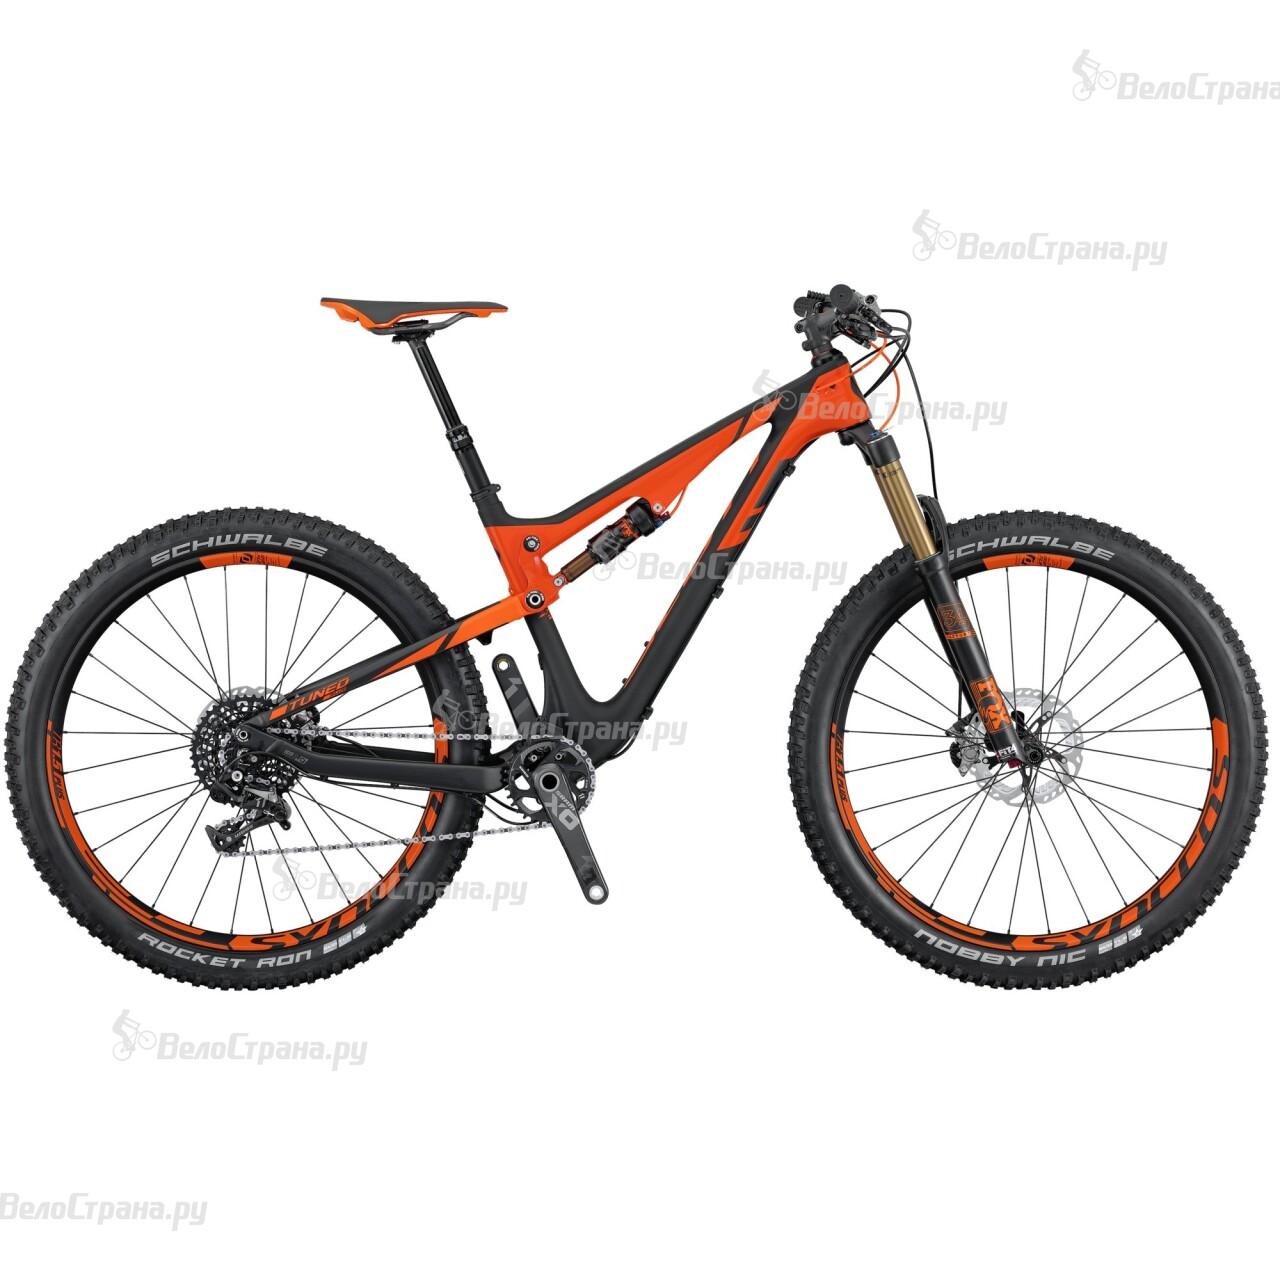 Велосипед Scott Genius 700 Tuned (2016) велосипед scott genius lt 700 tuned plus 2016